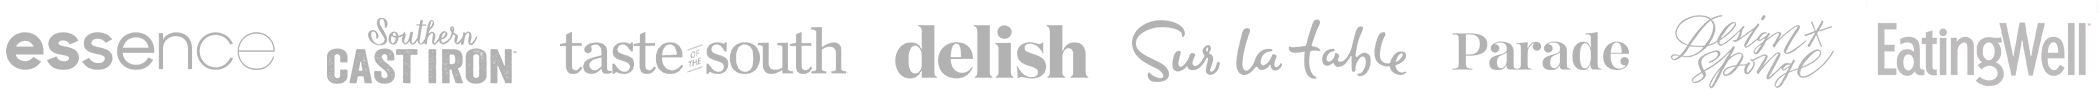 Logos: Essence, Taste of the South, Sur la Table, Southern Cast Iron, Delish, Parade, DesignSponge, EatingWell